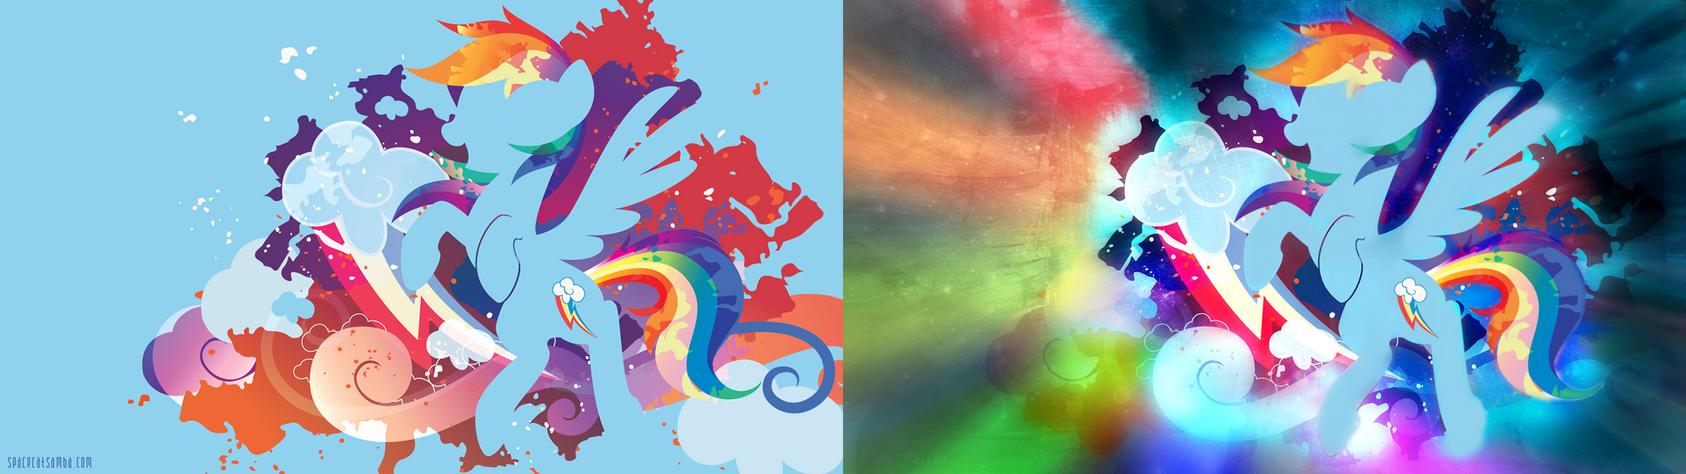 Rainbow Dash Light Silhouette Wall Edited by ConnieTheCasanova